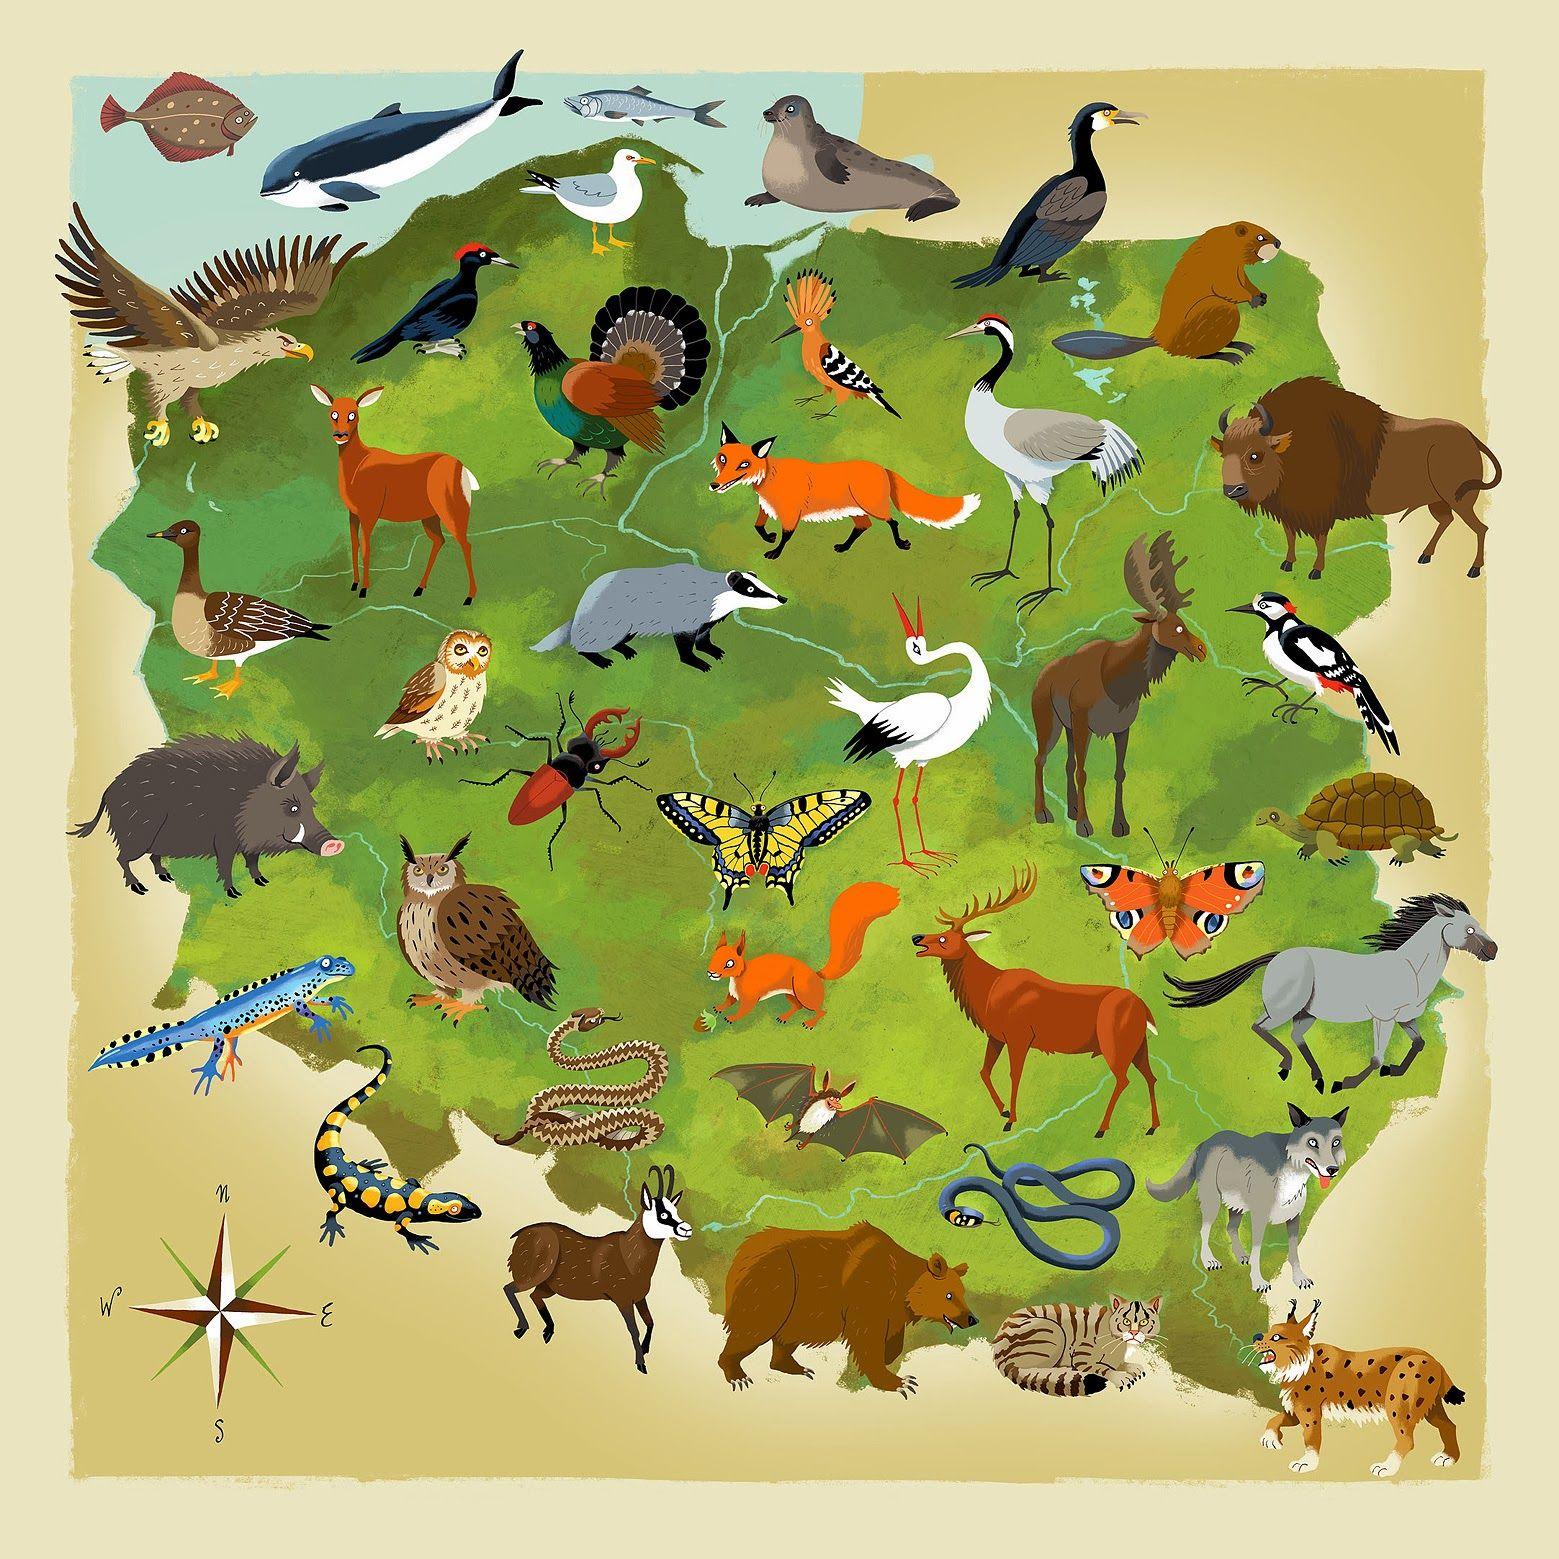 Fauna Srodkowoeuropejska With Images World Thinking Day Illustrated Map Fauna